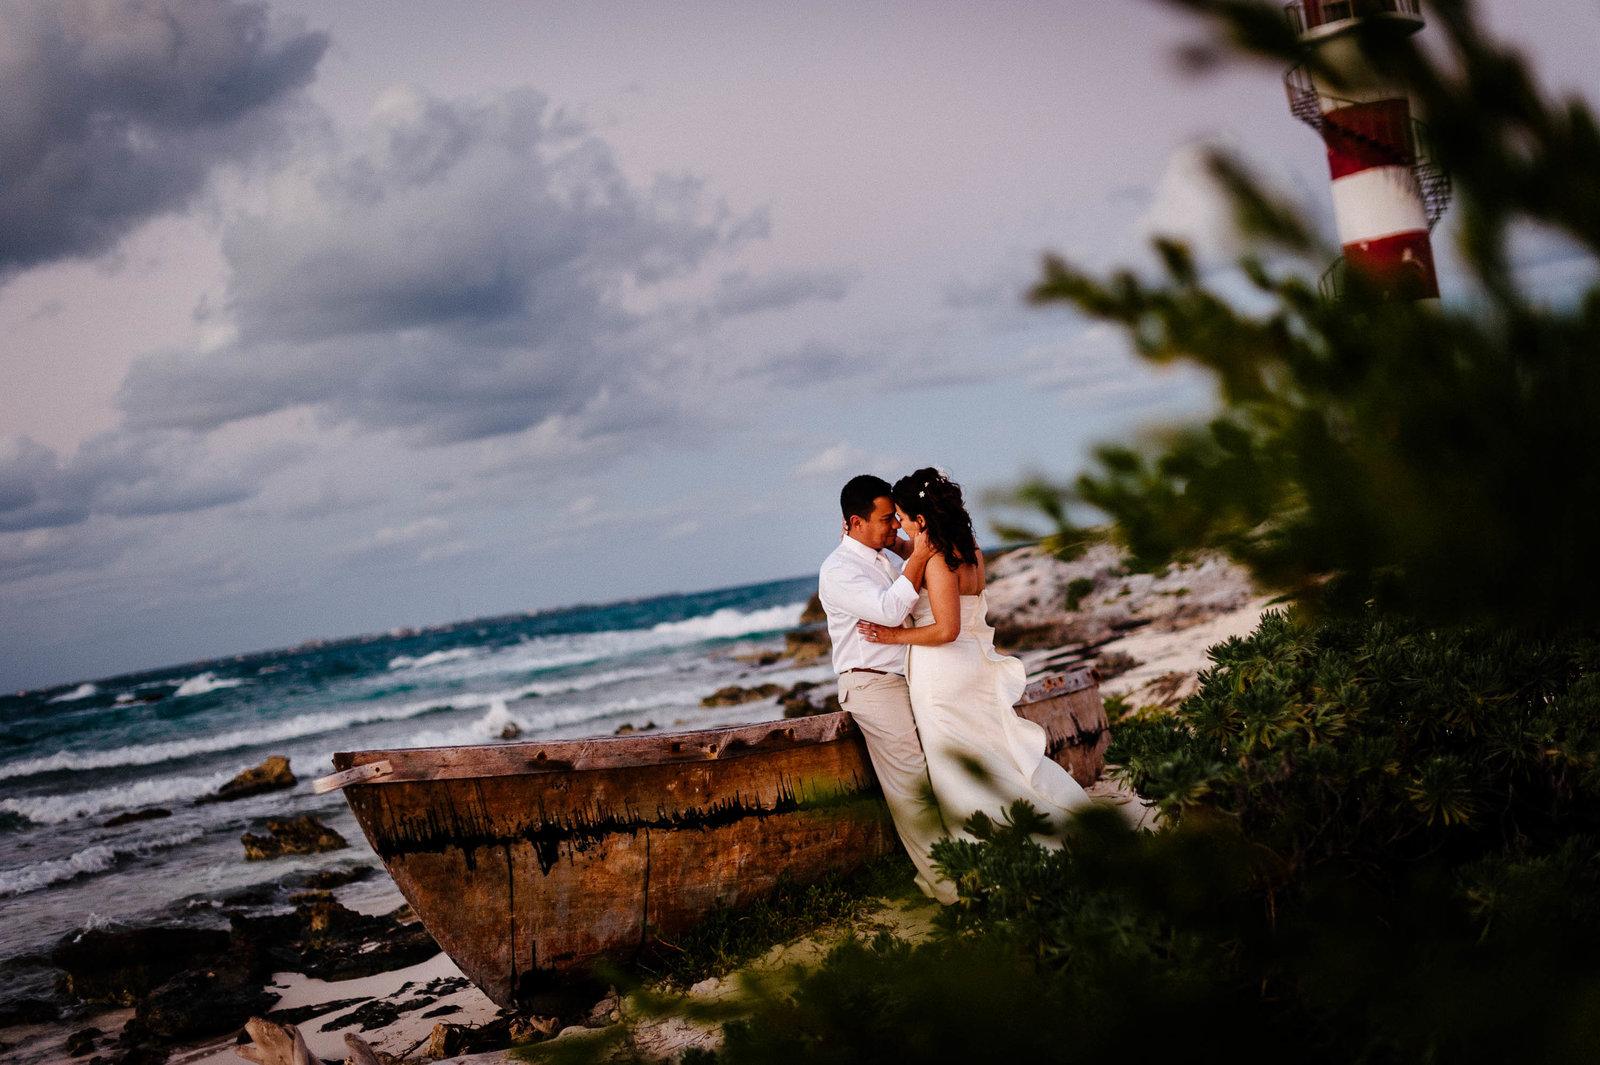 270-El-paso-wedding-photographer-ErMi_0605